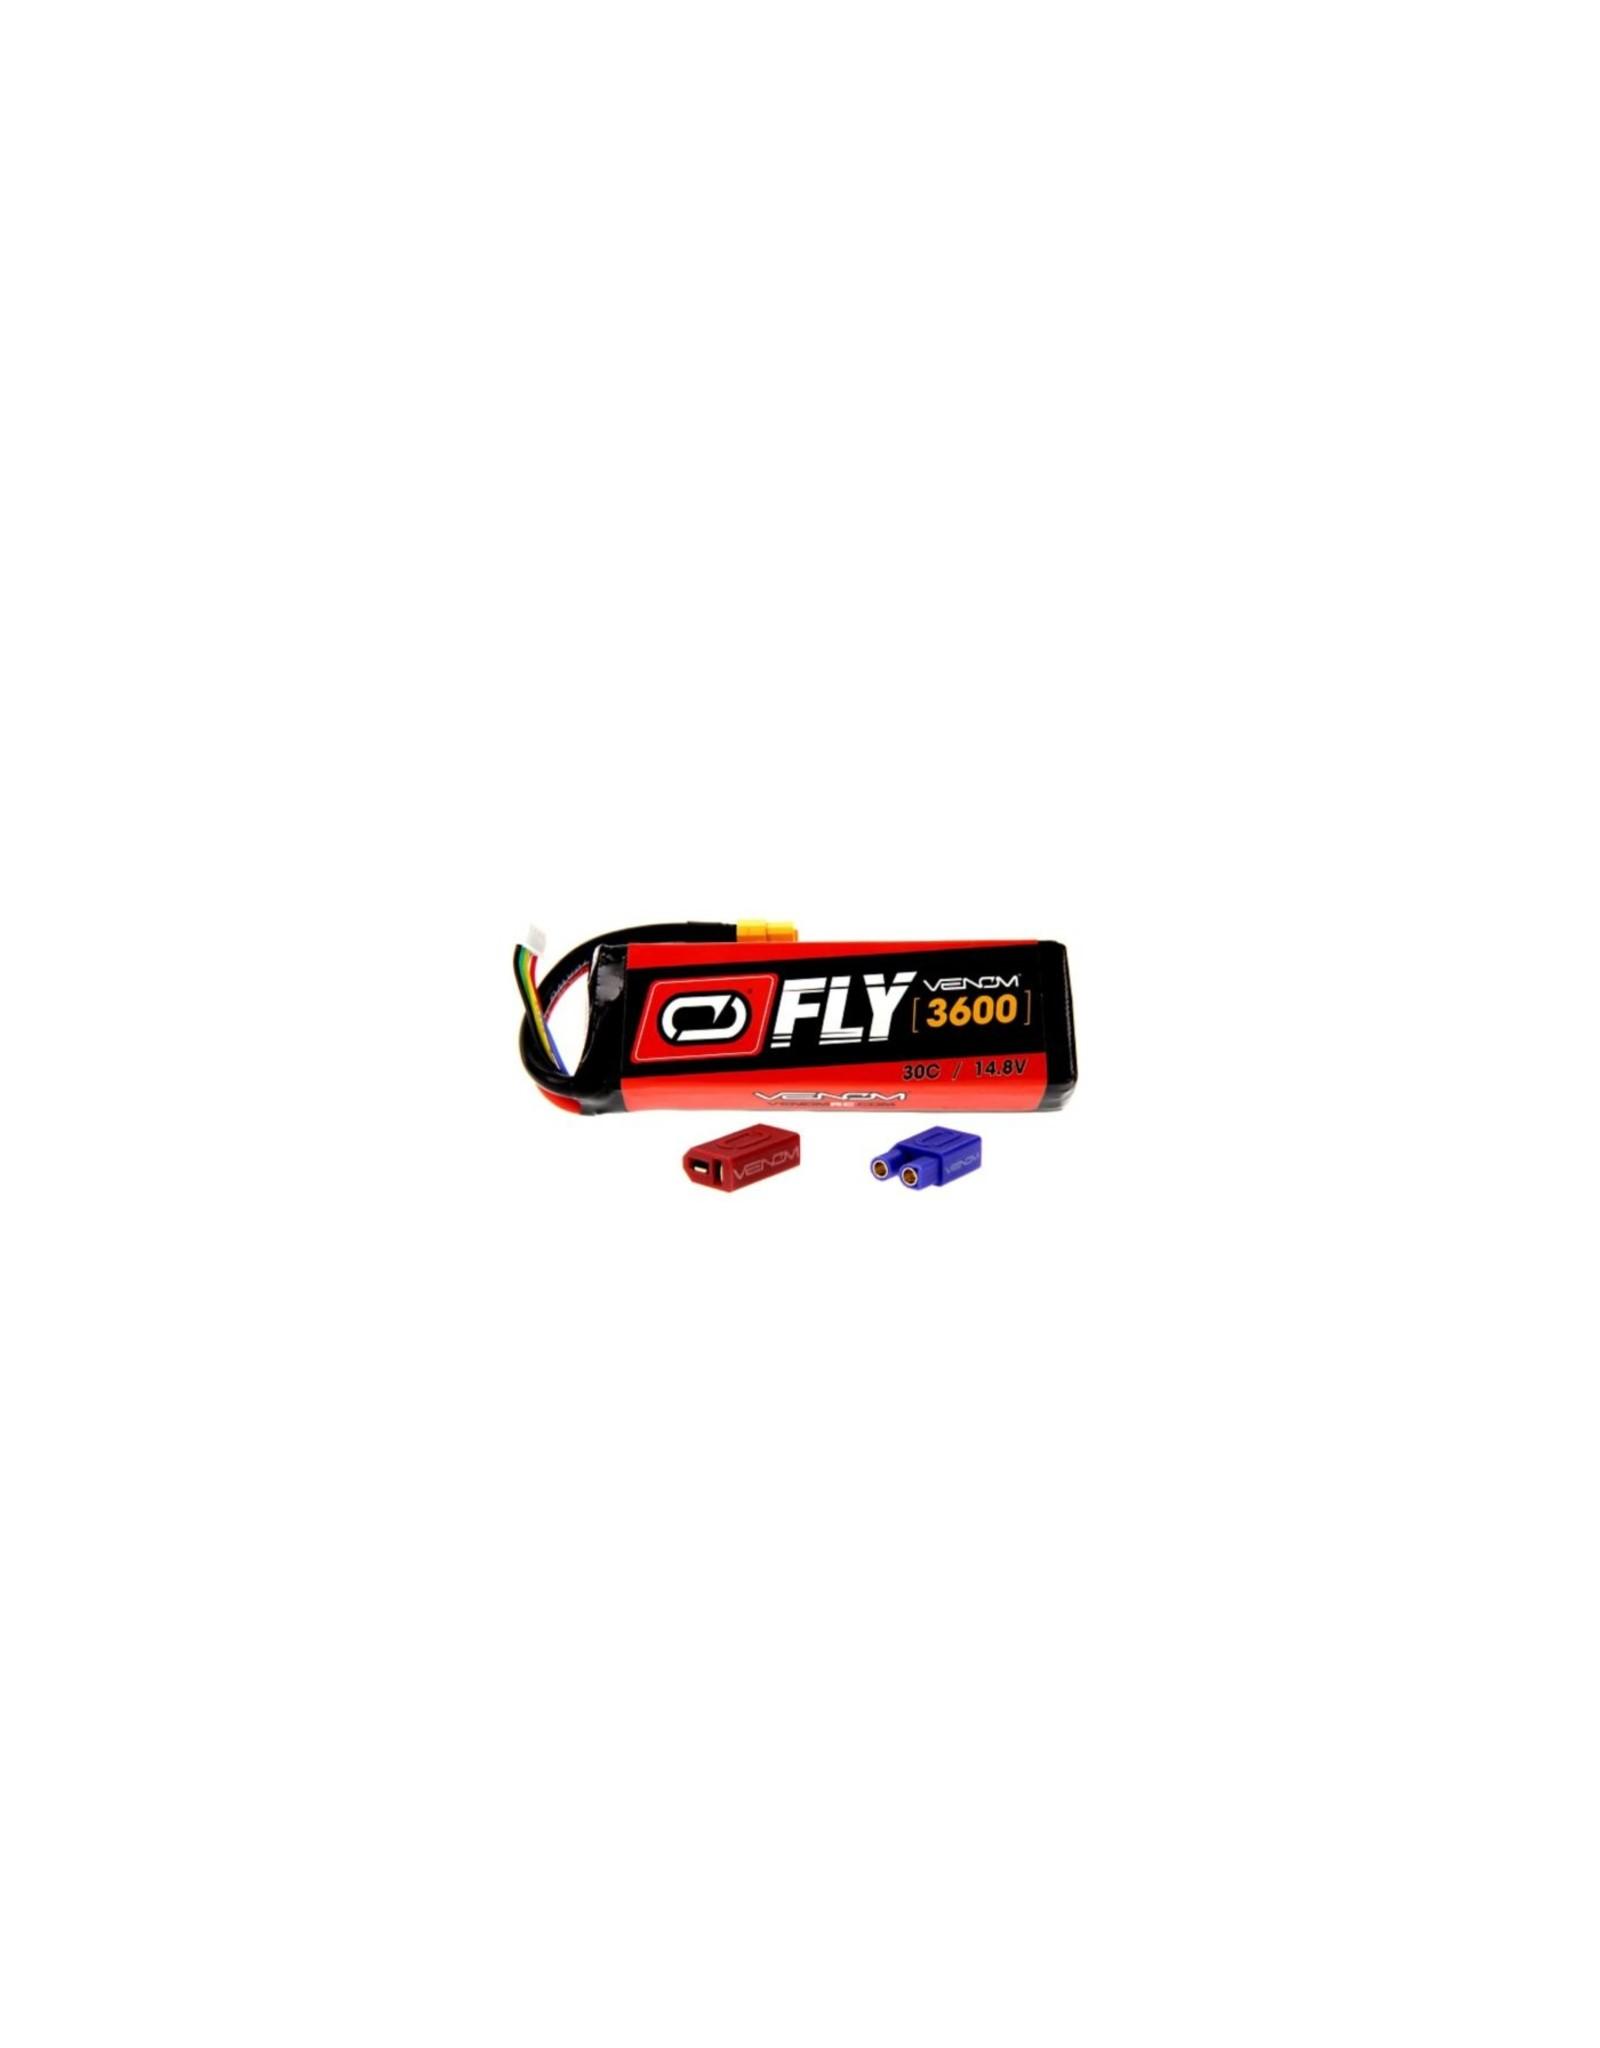 Venom Racing VNR25016 - 14.8V 3600mAh 4S 30C FLY LiPo Battery: UNI 2.0 Plug